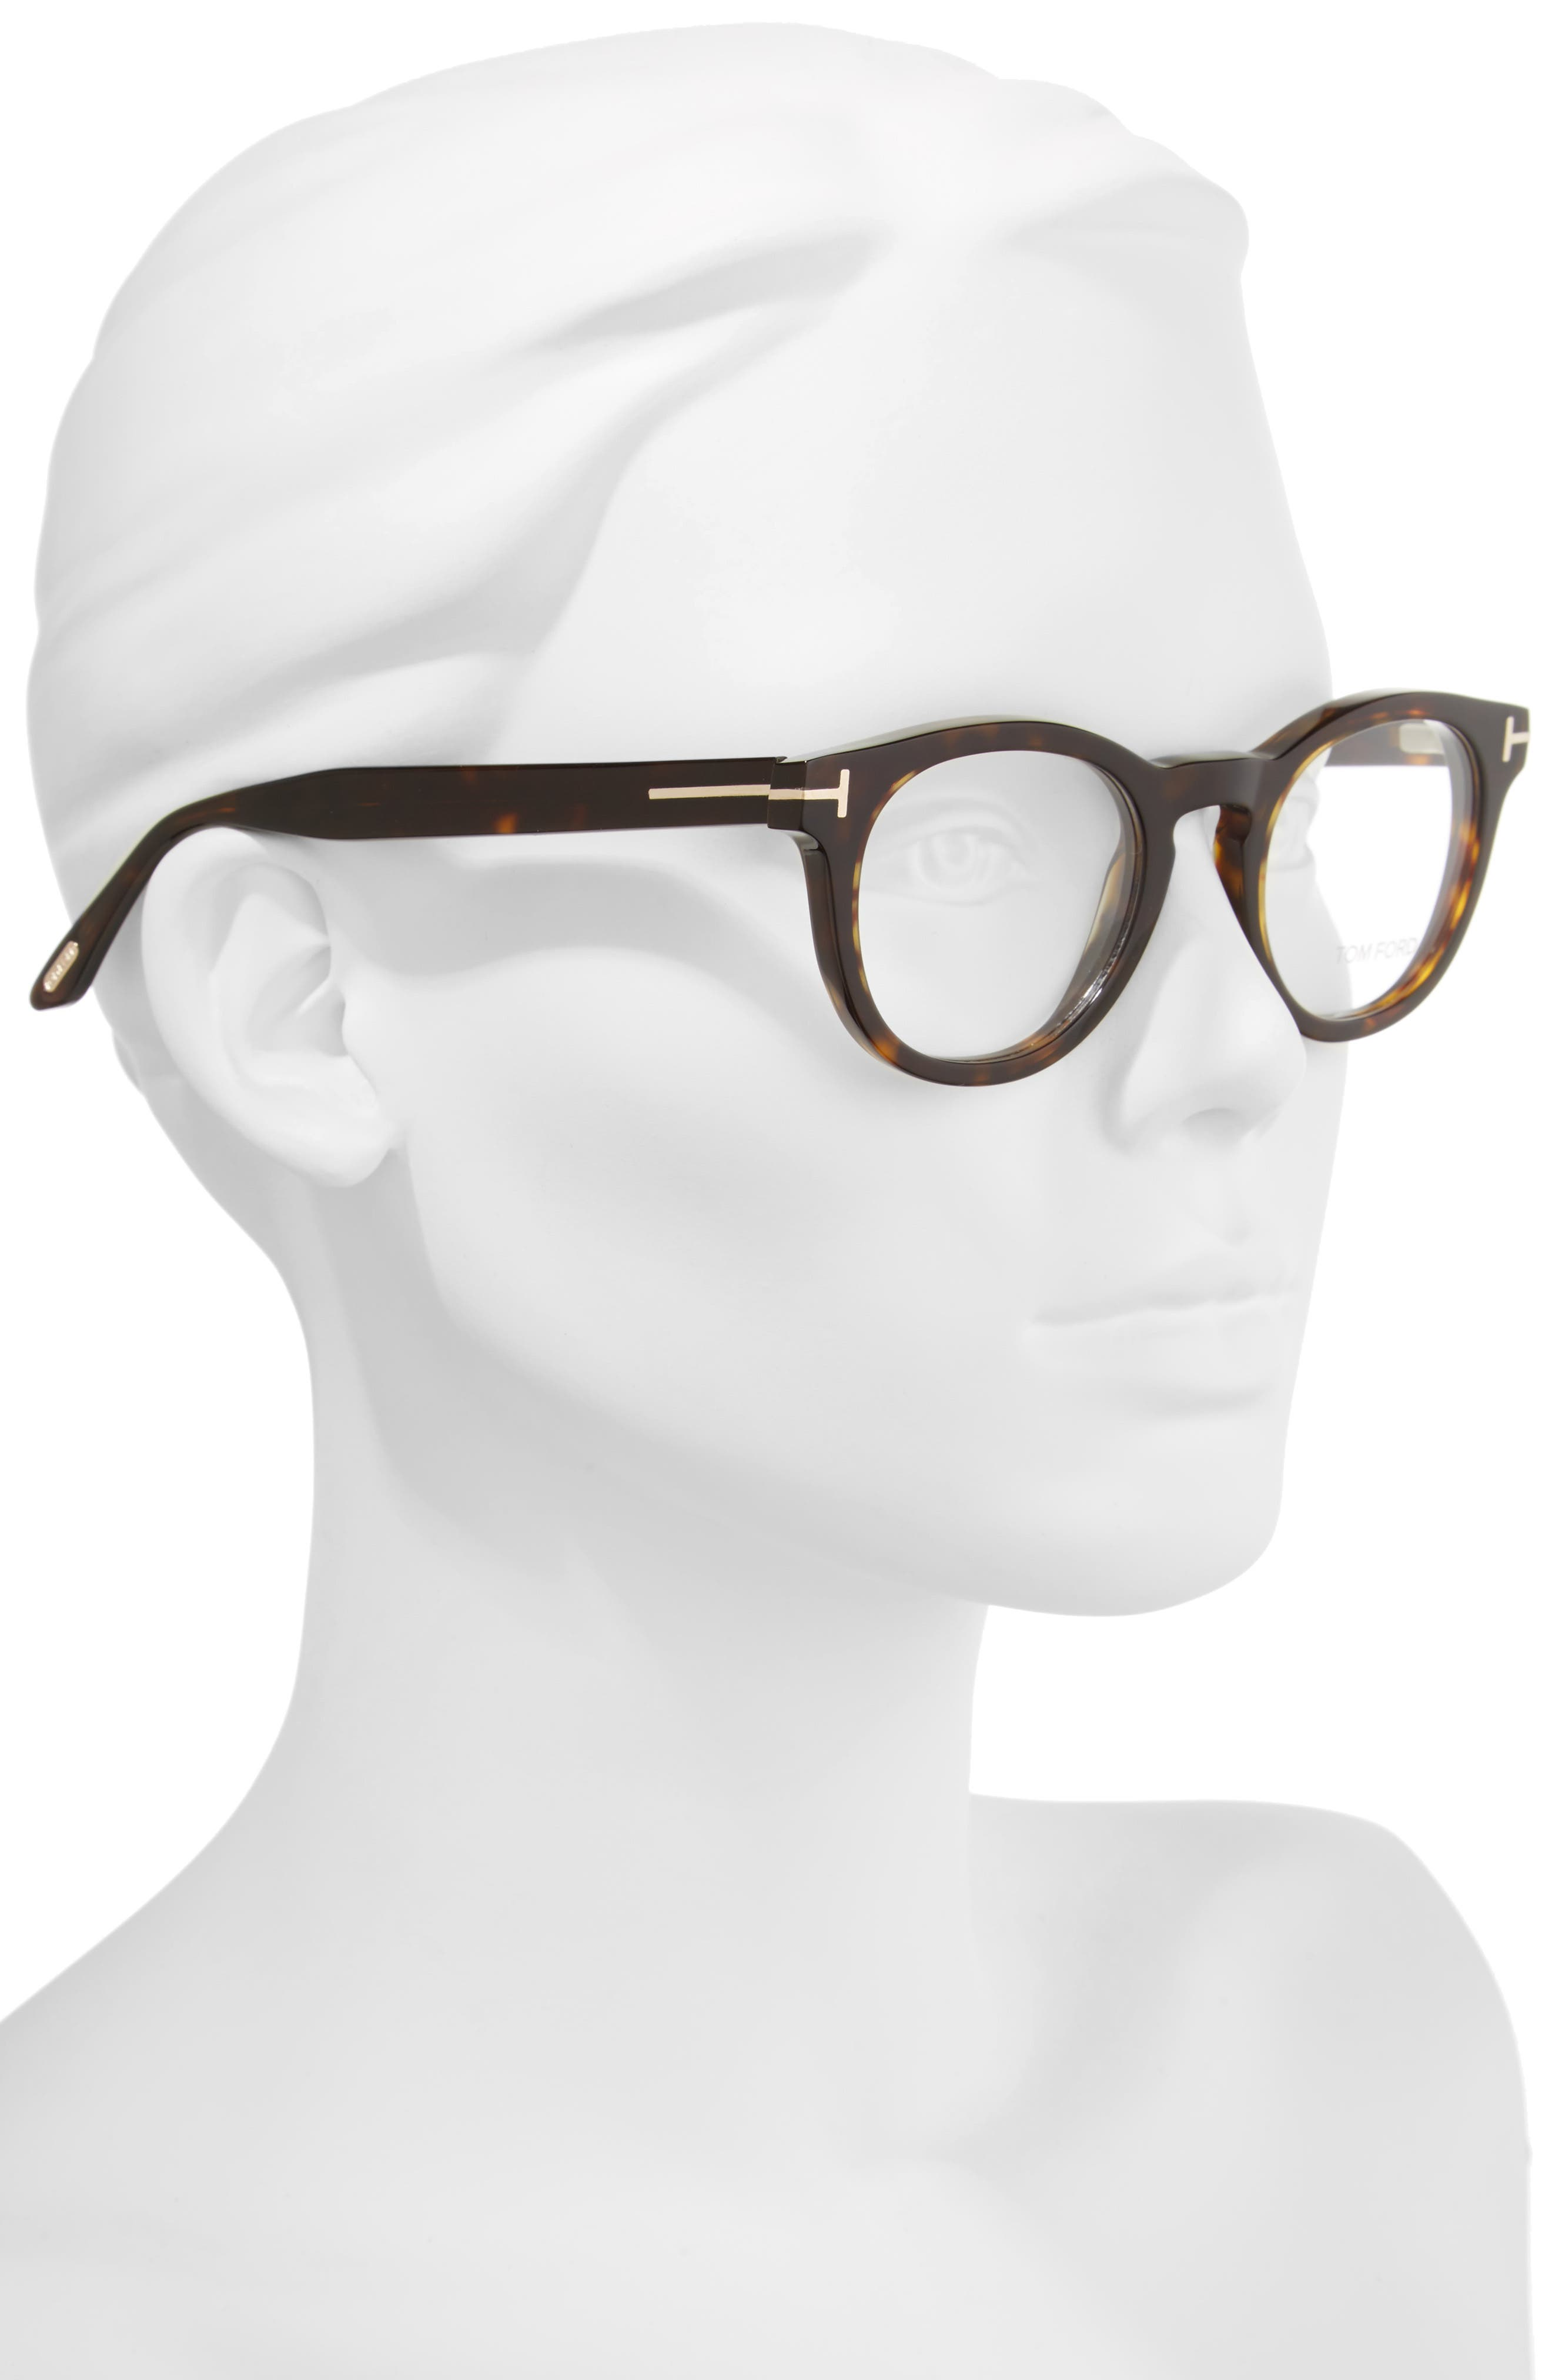 48mm Round Optical Glasses,                             Alternate thumbnail 2, color,                             Classic Dark Havana